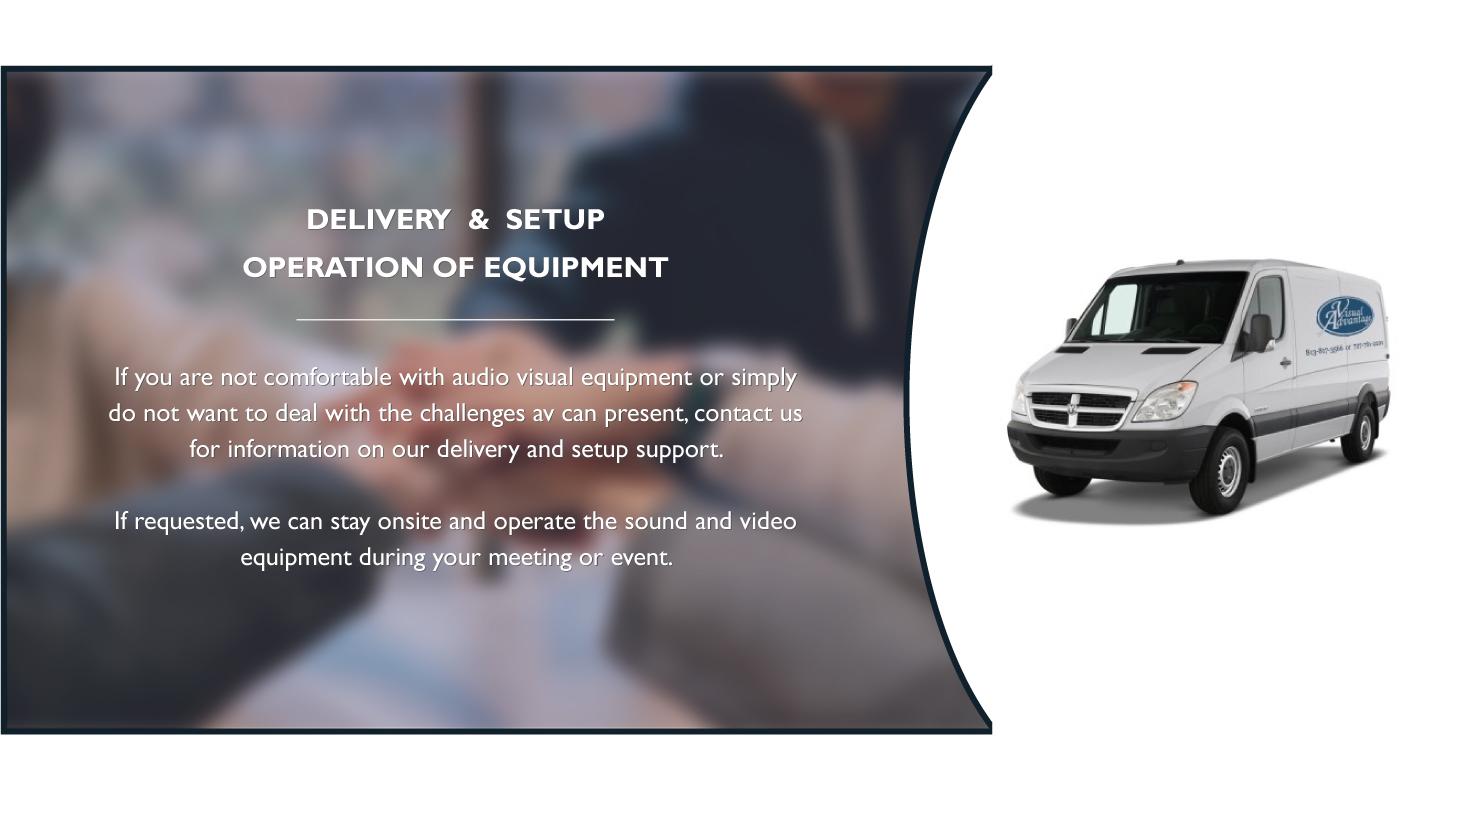 Delivery-and-Setup-Background-Visual-Advantage.jpg